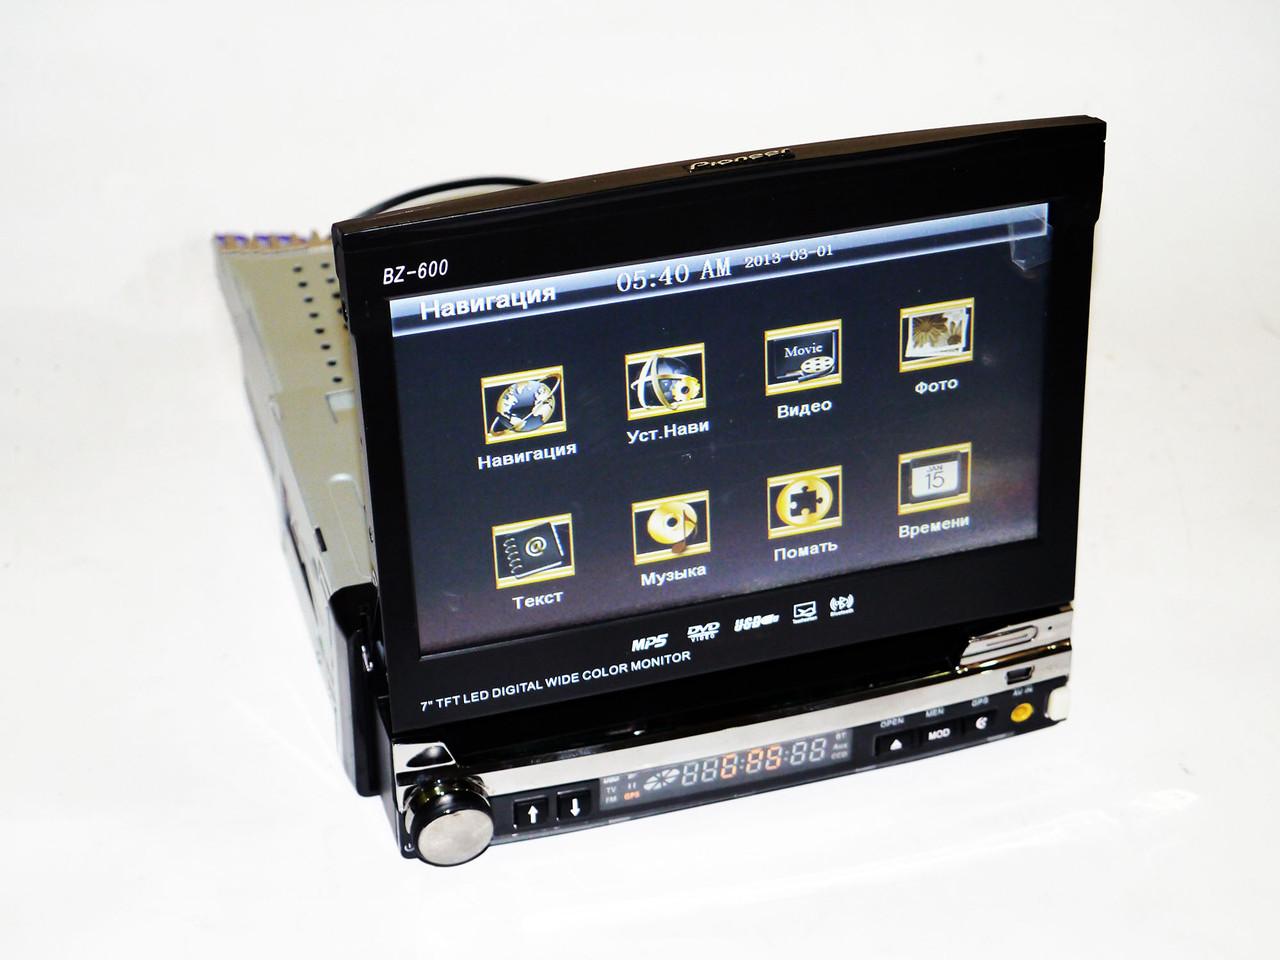 Автомагнитола 1din Pioneer S600 + GPS + TV + Камера + ТВ антенна